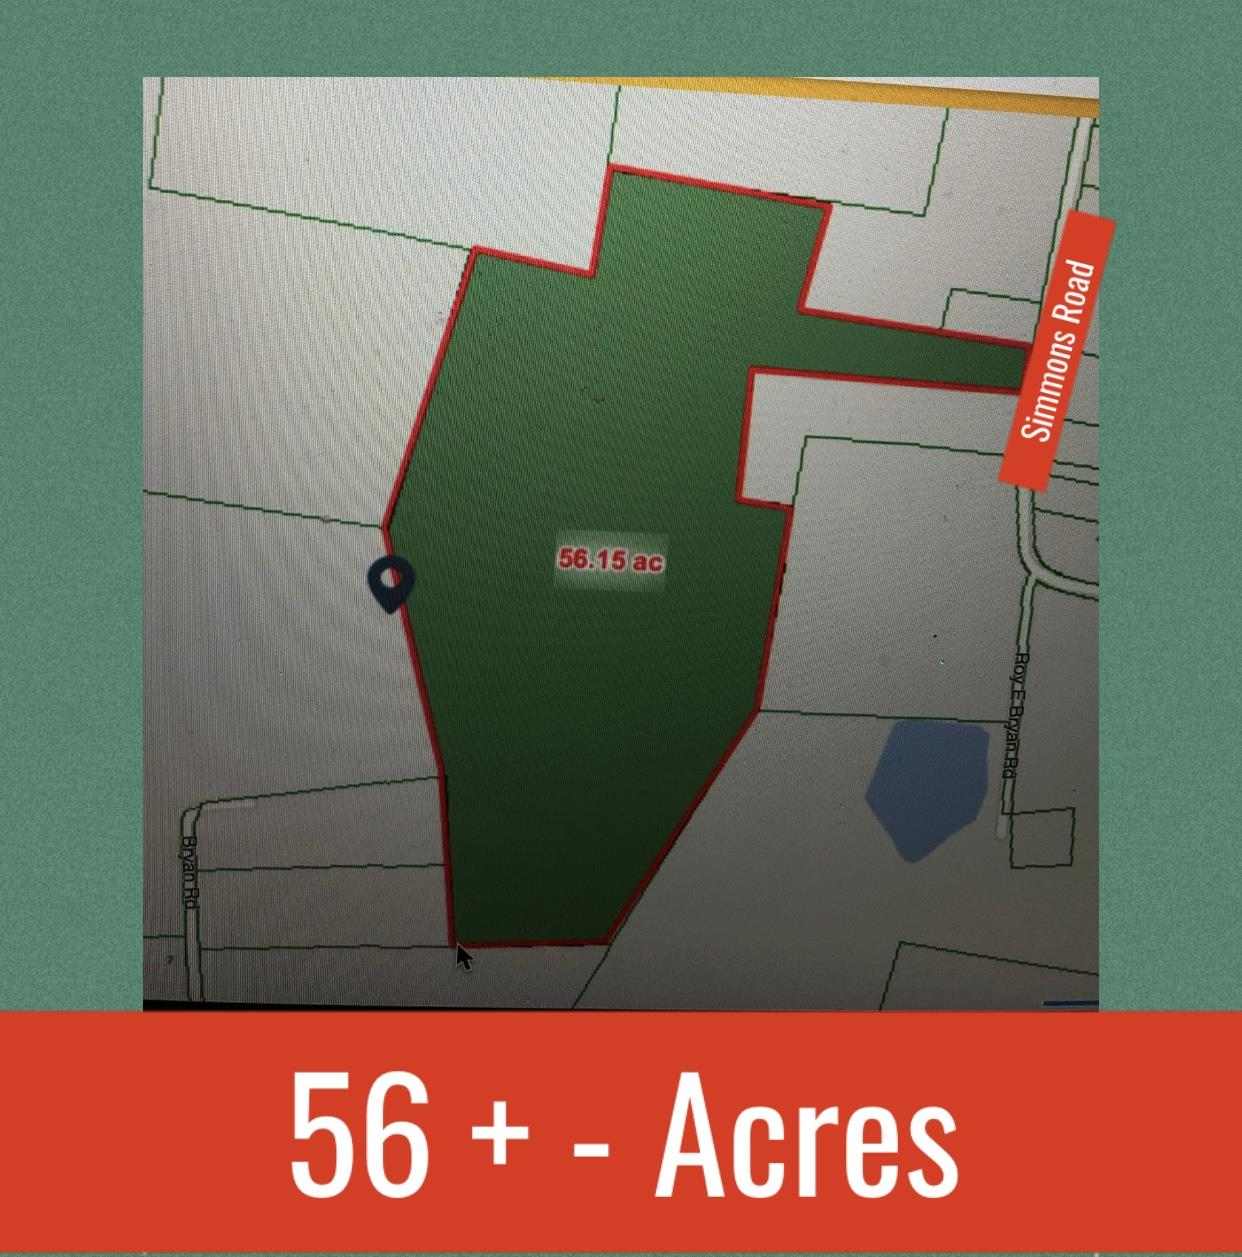 0 Simmons Rd (56 acres), Hillsboro, TN 37342 - Hillsboro, TN real estate listing